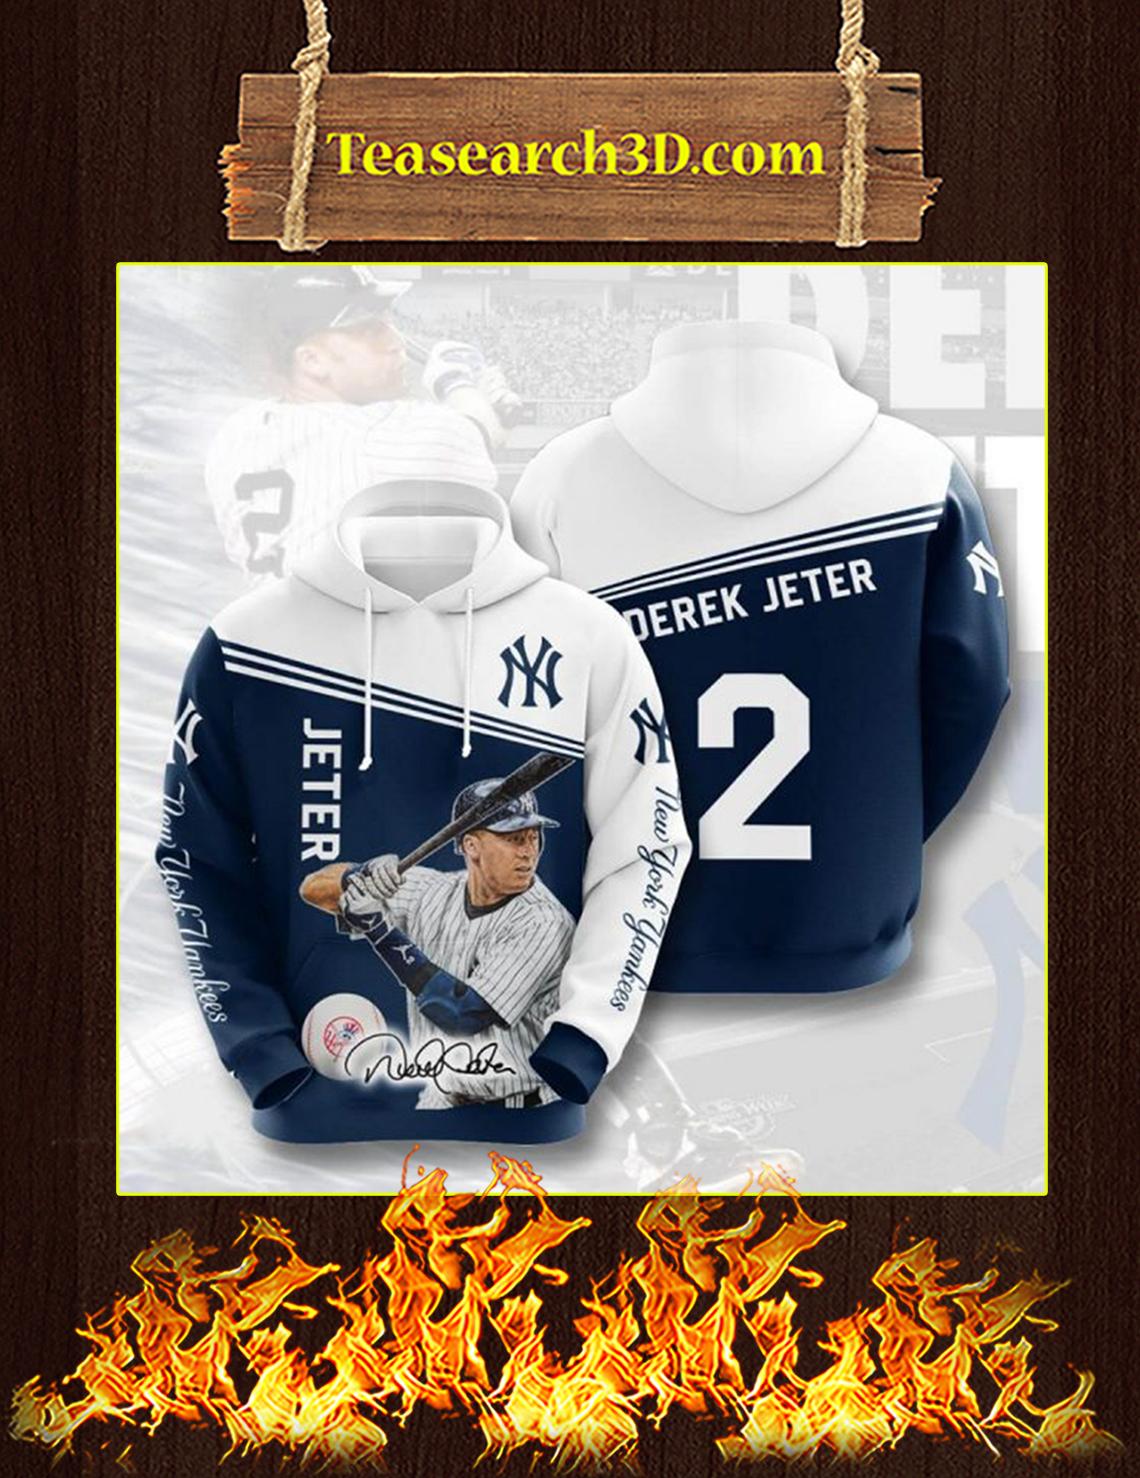 Derek Jeter New York Yankees 3D Hoodie Size L